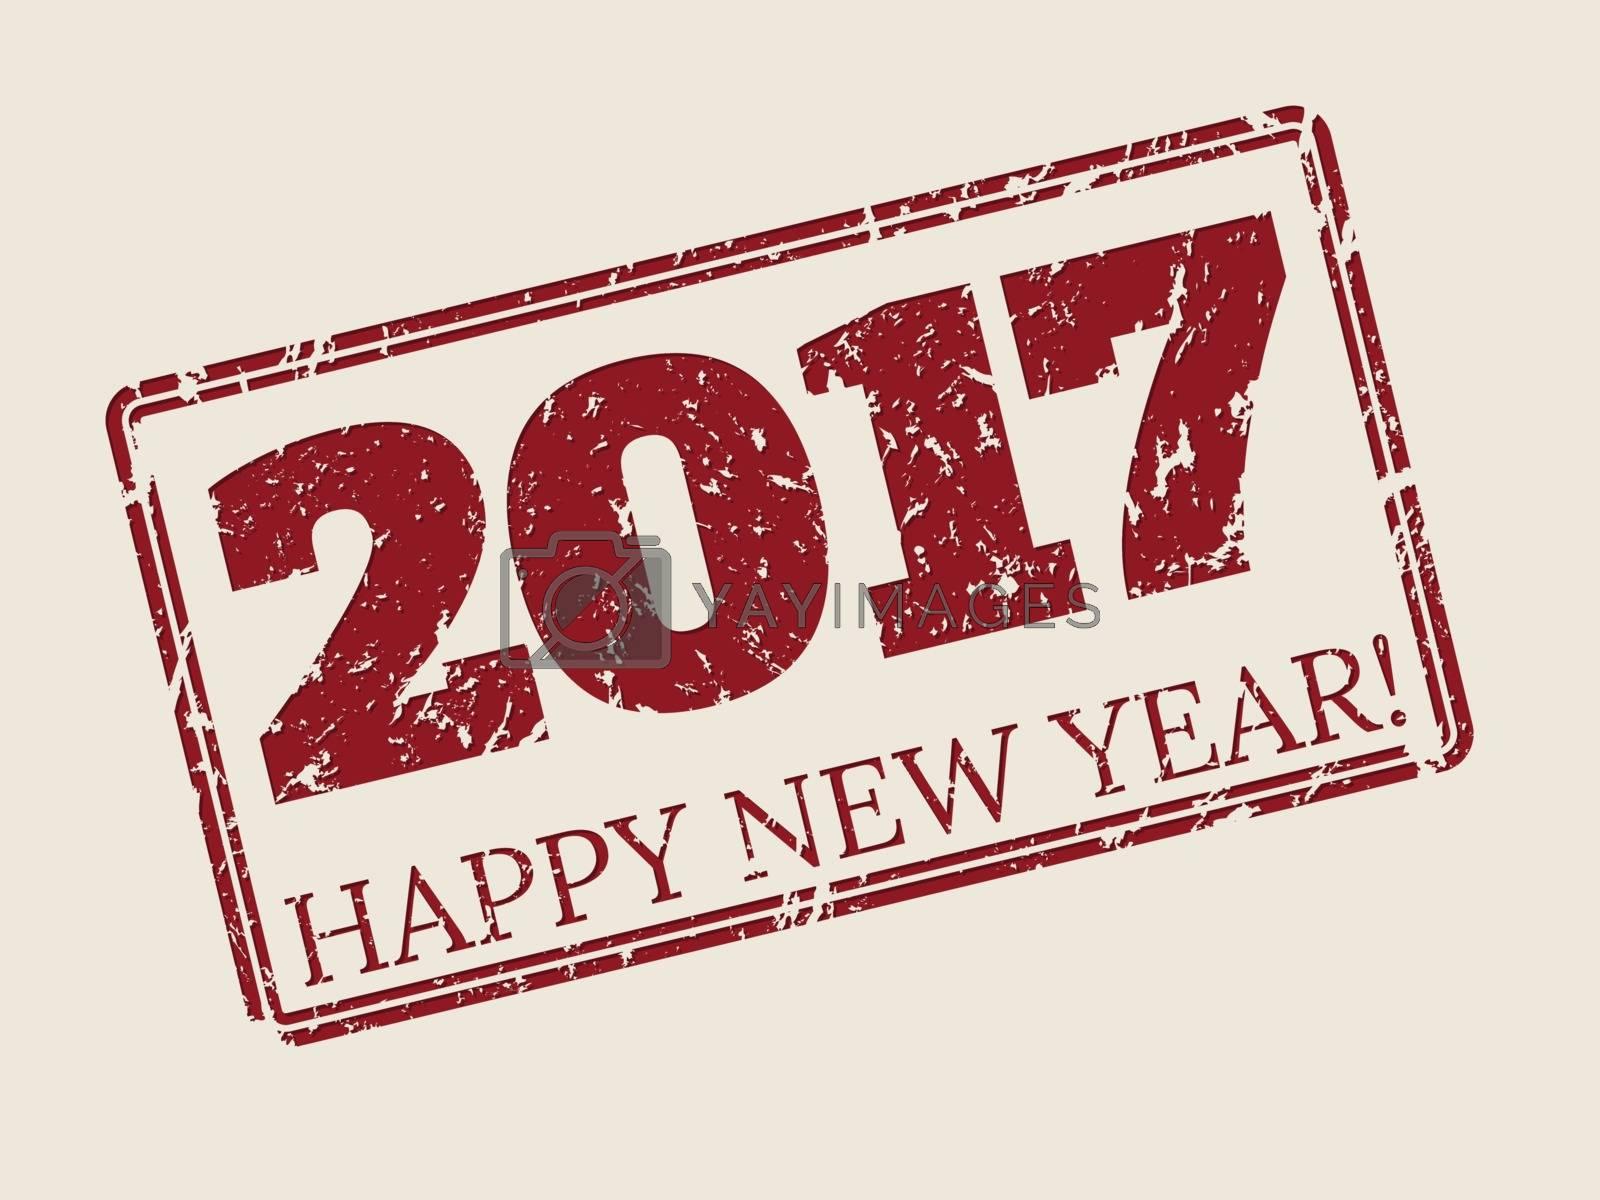 Happy new year 2017 stamper design by vipervxw